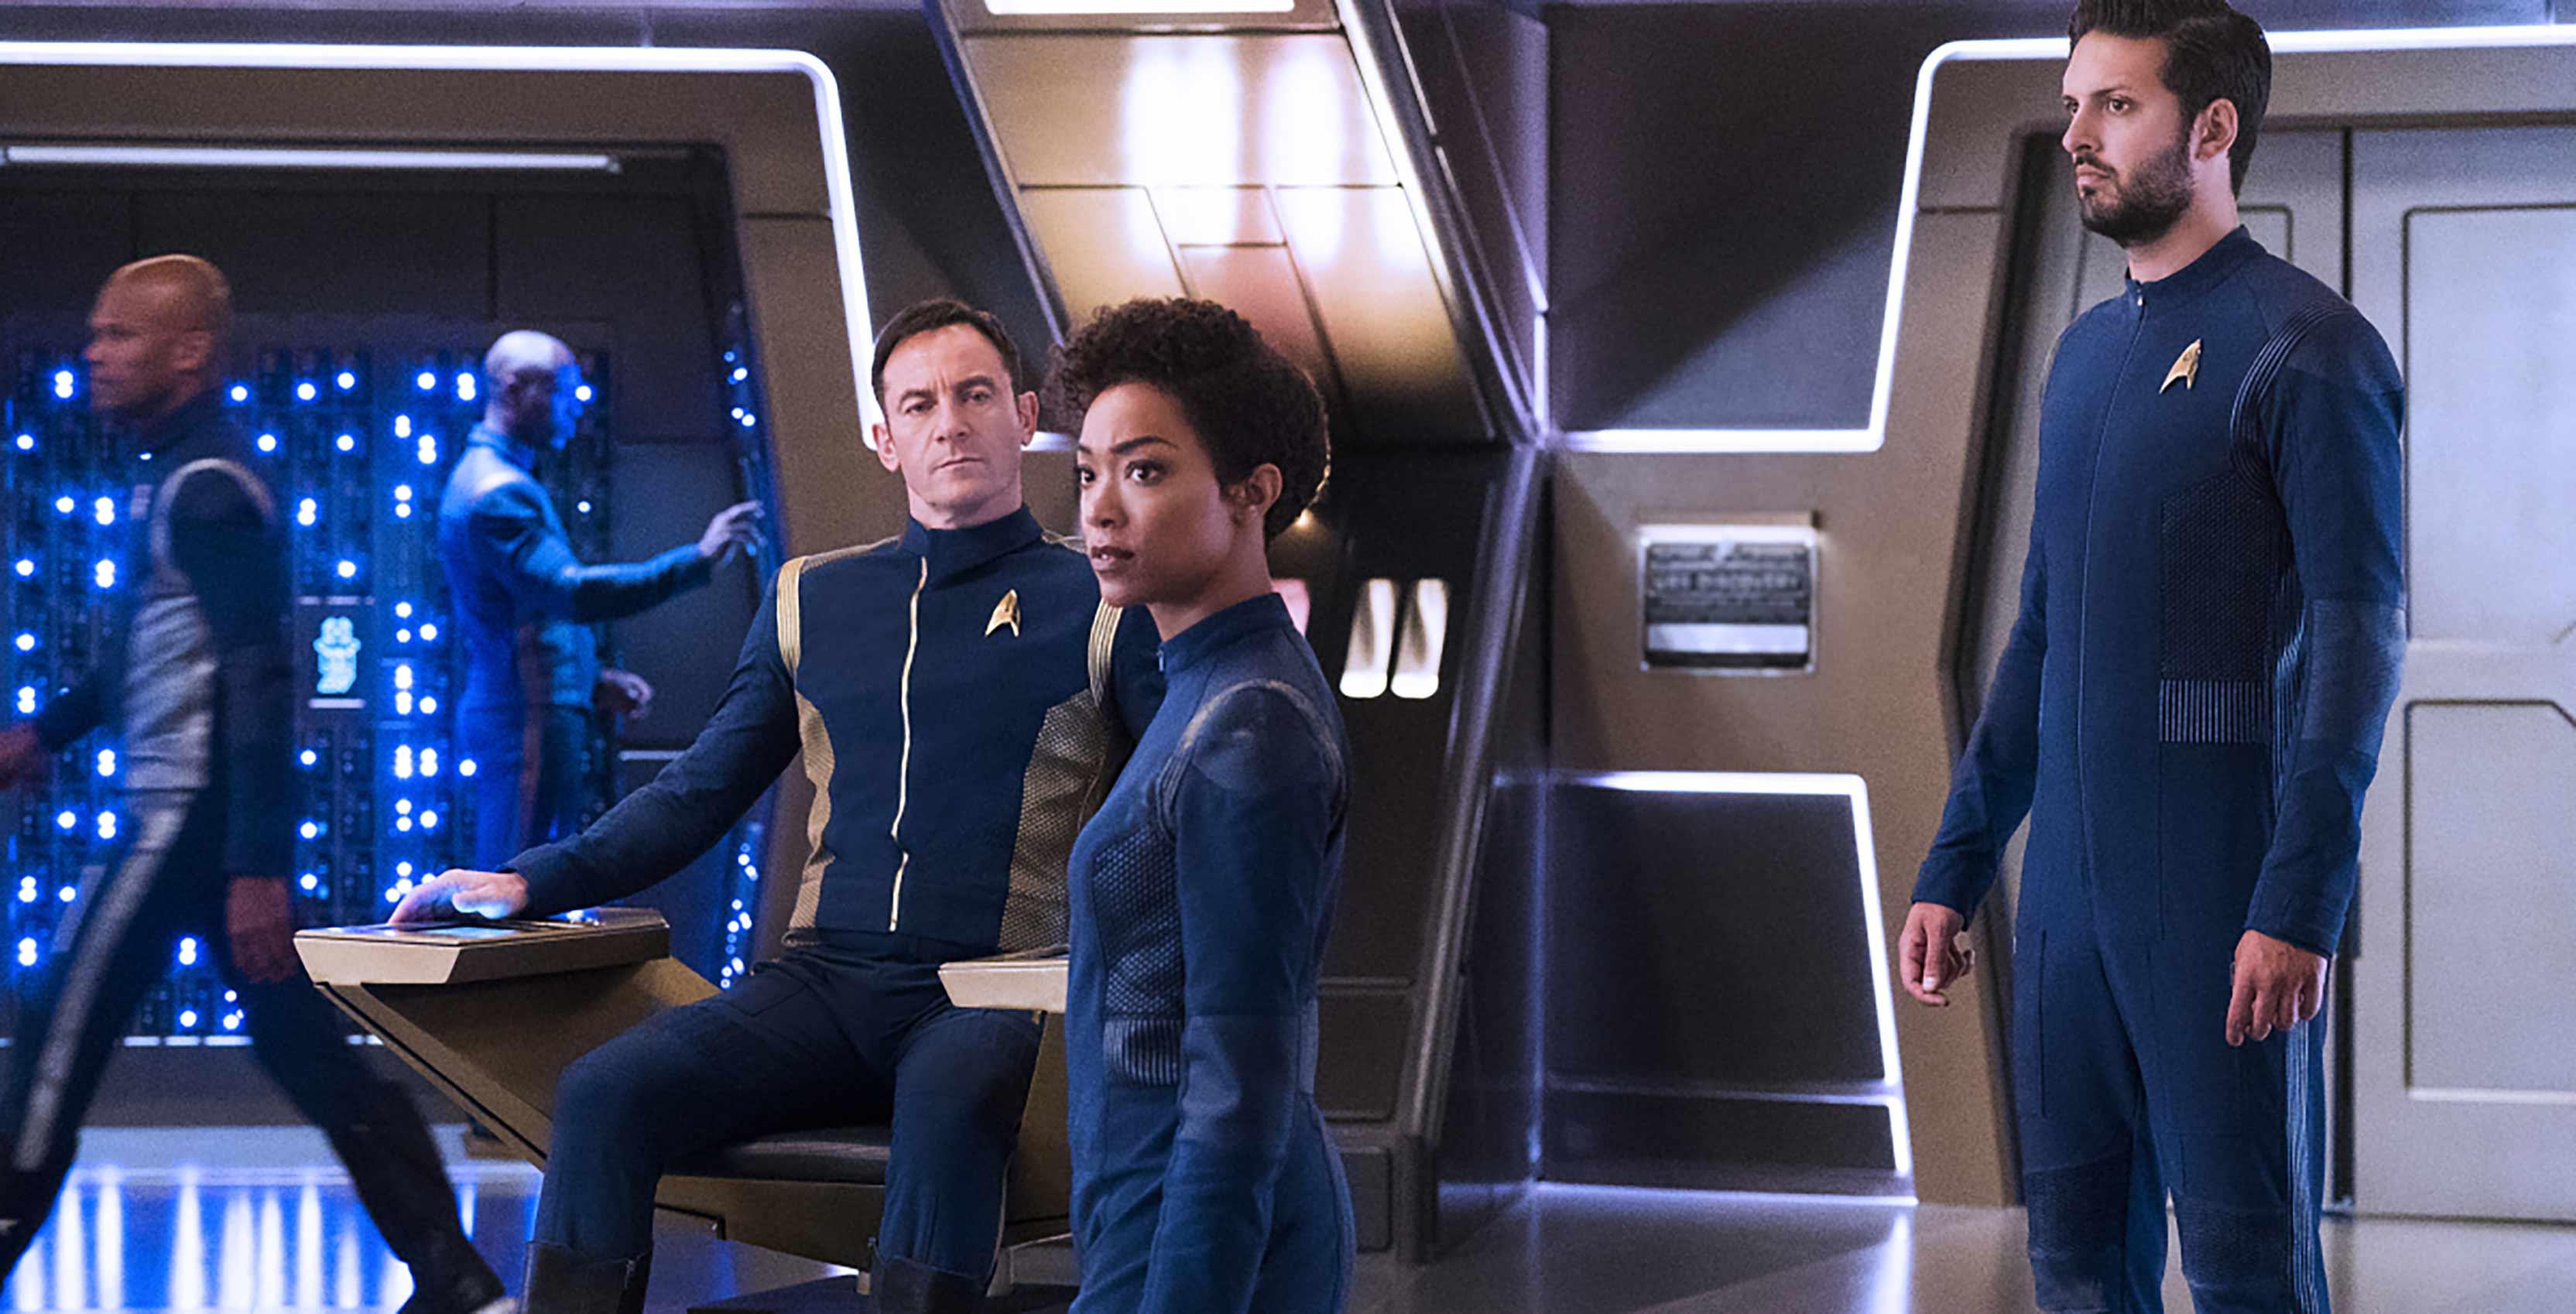 Star Trek: Discovery crew